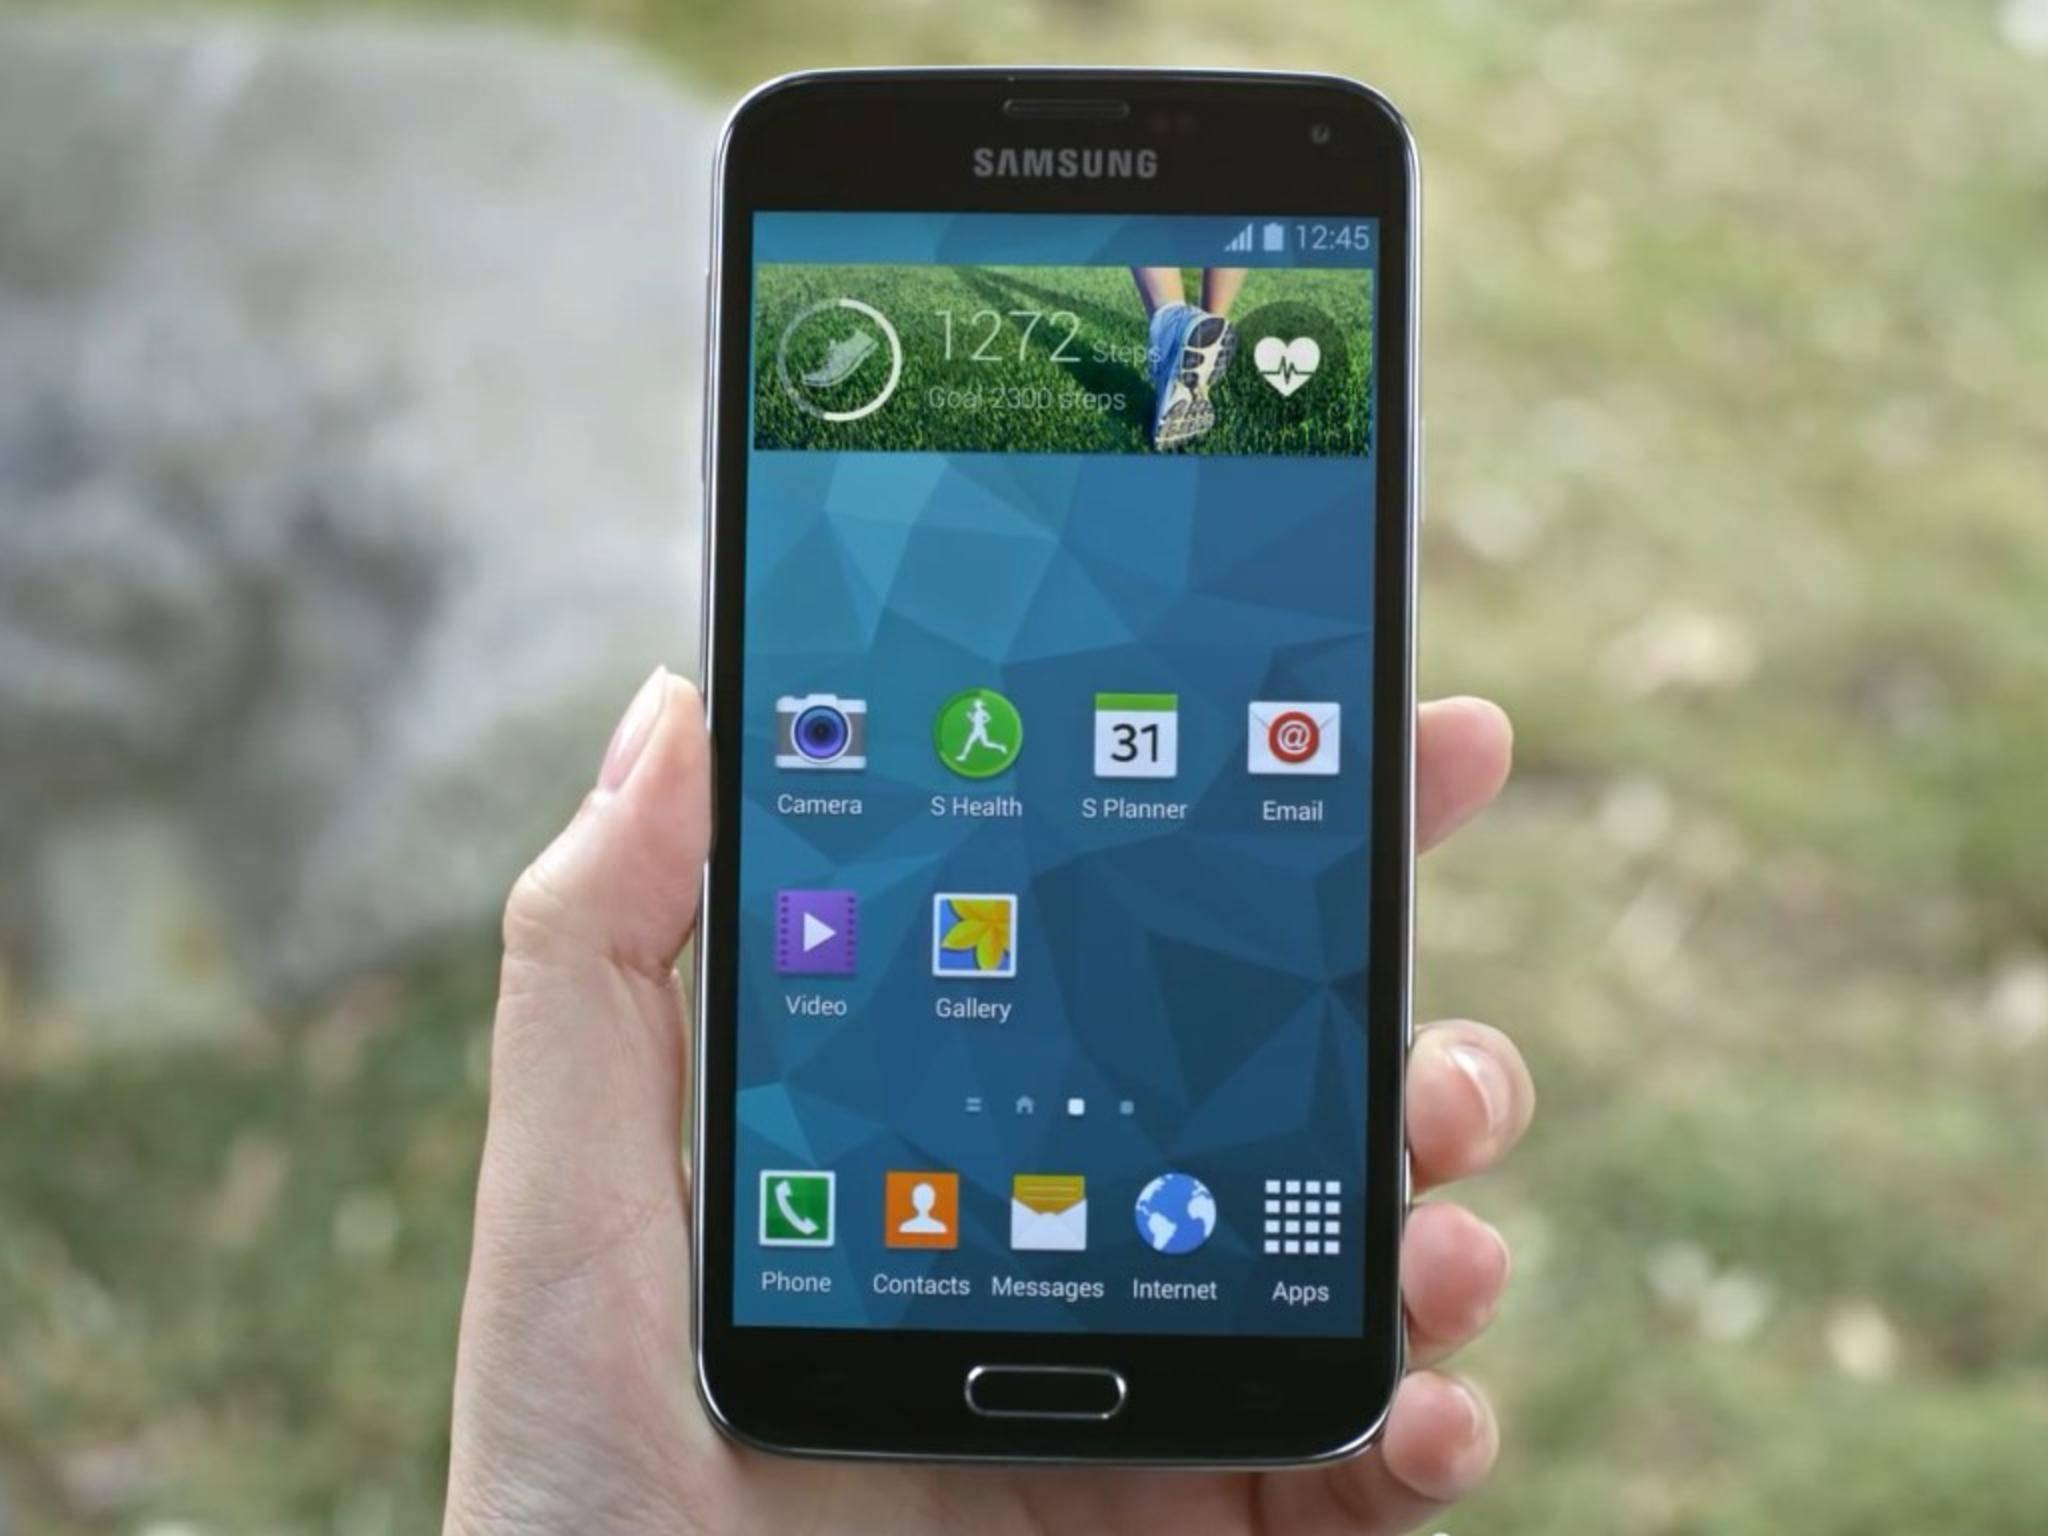 Samsung Galaxy S5: Platz 4 im Google-Ranking 2014.